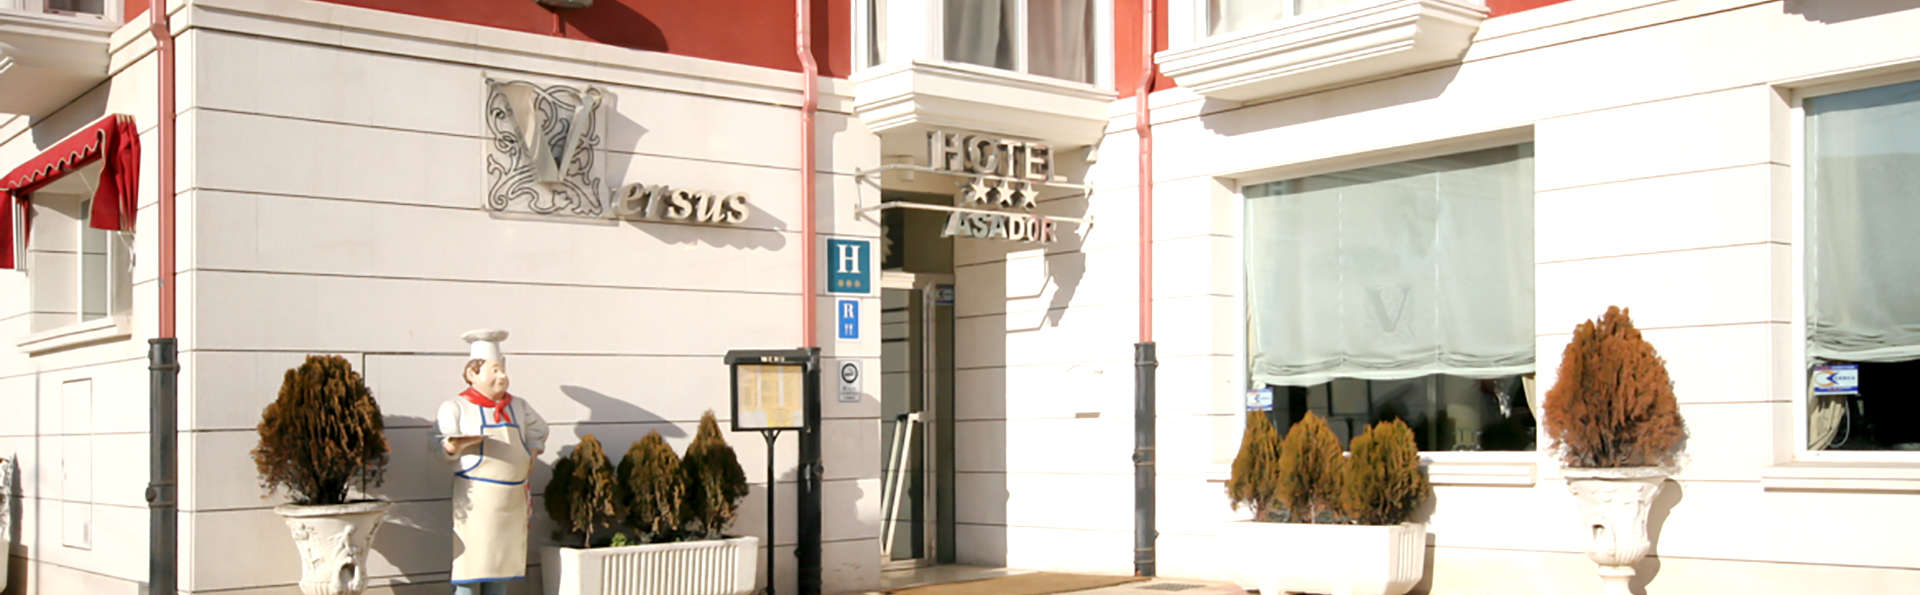 Hotel Asador H.M Versus - Edit_Front.jpg